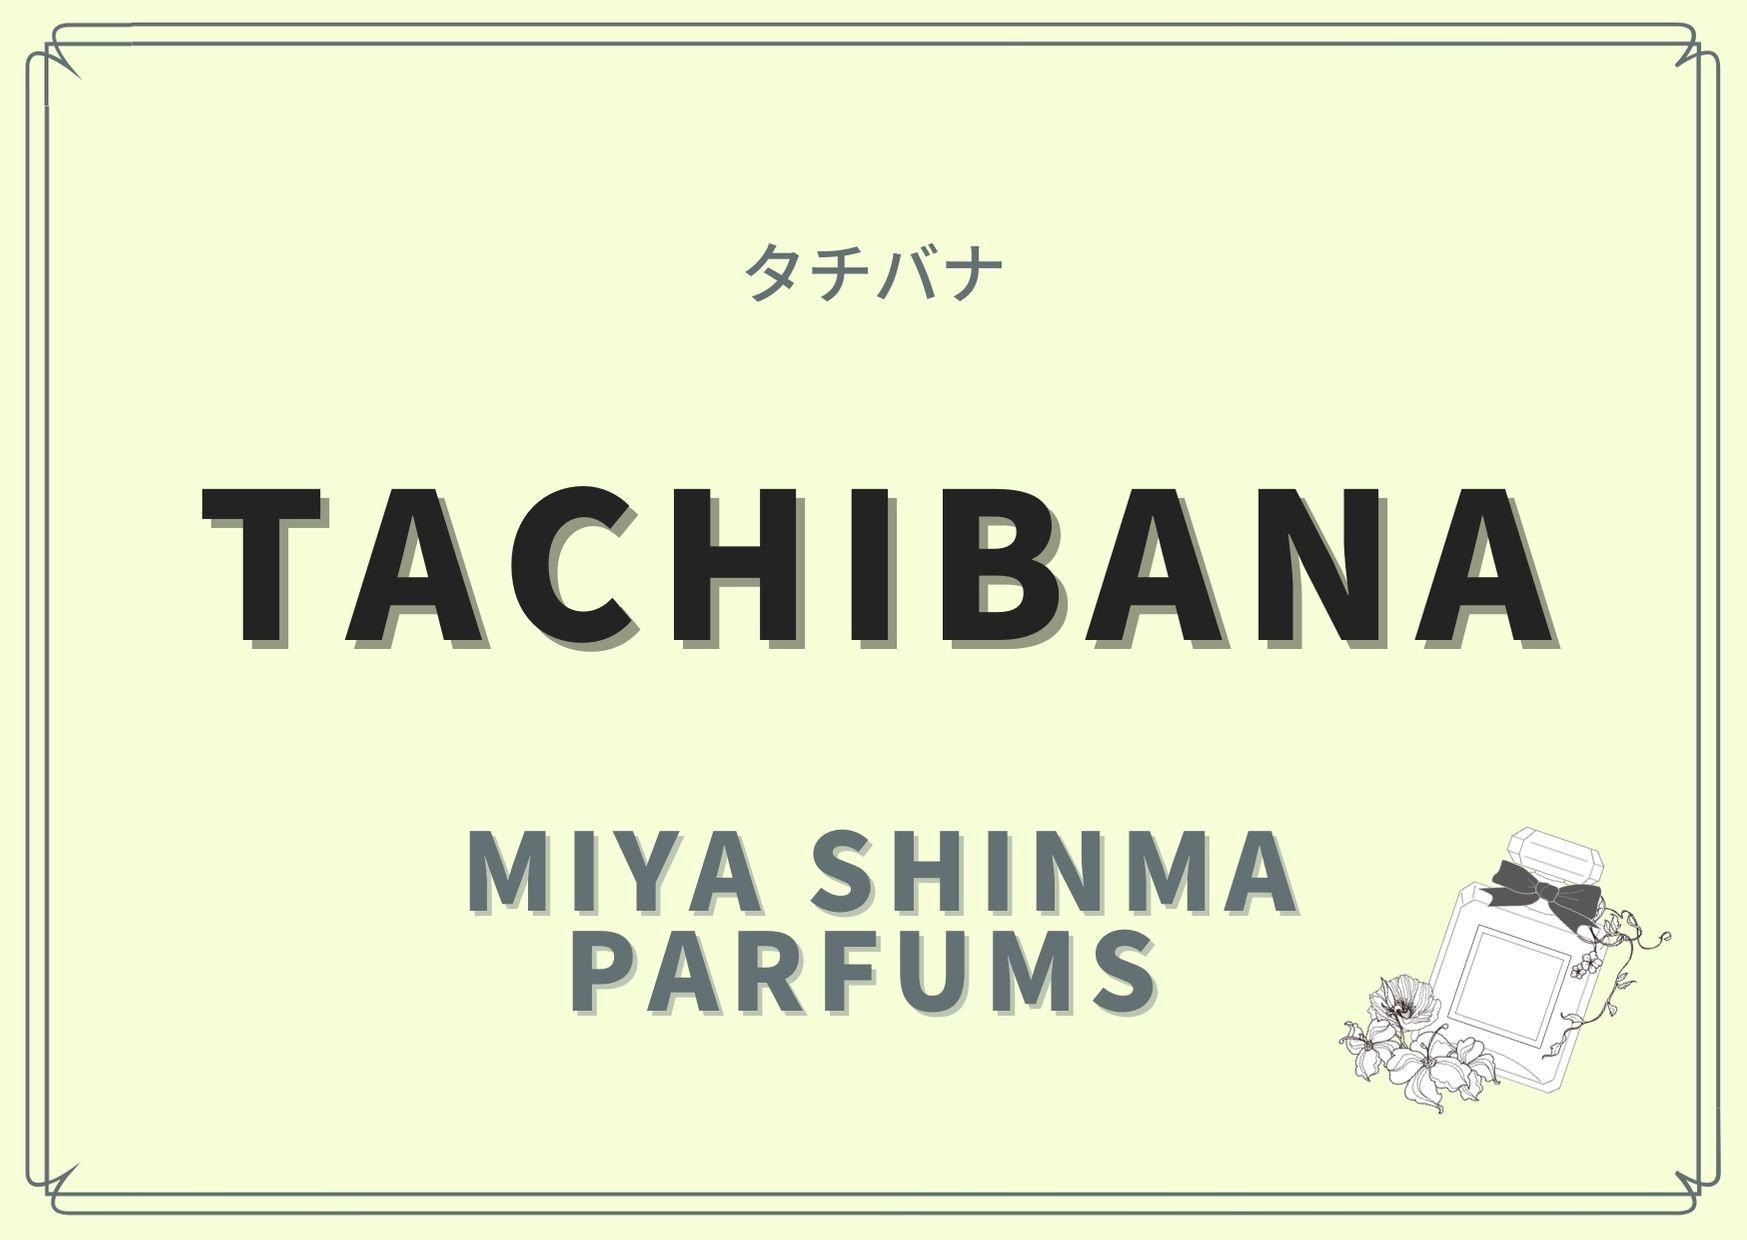 TACHIBANA(タチバナ)/Miya Shinma parfums (ミヤ シンマ パルファン)